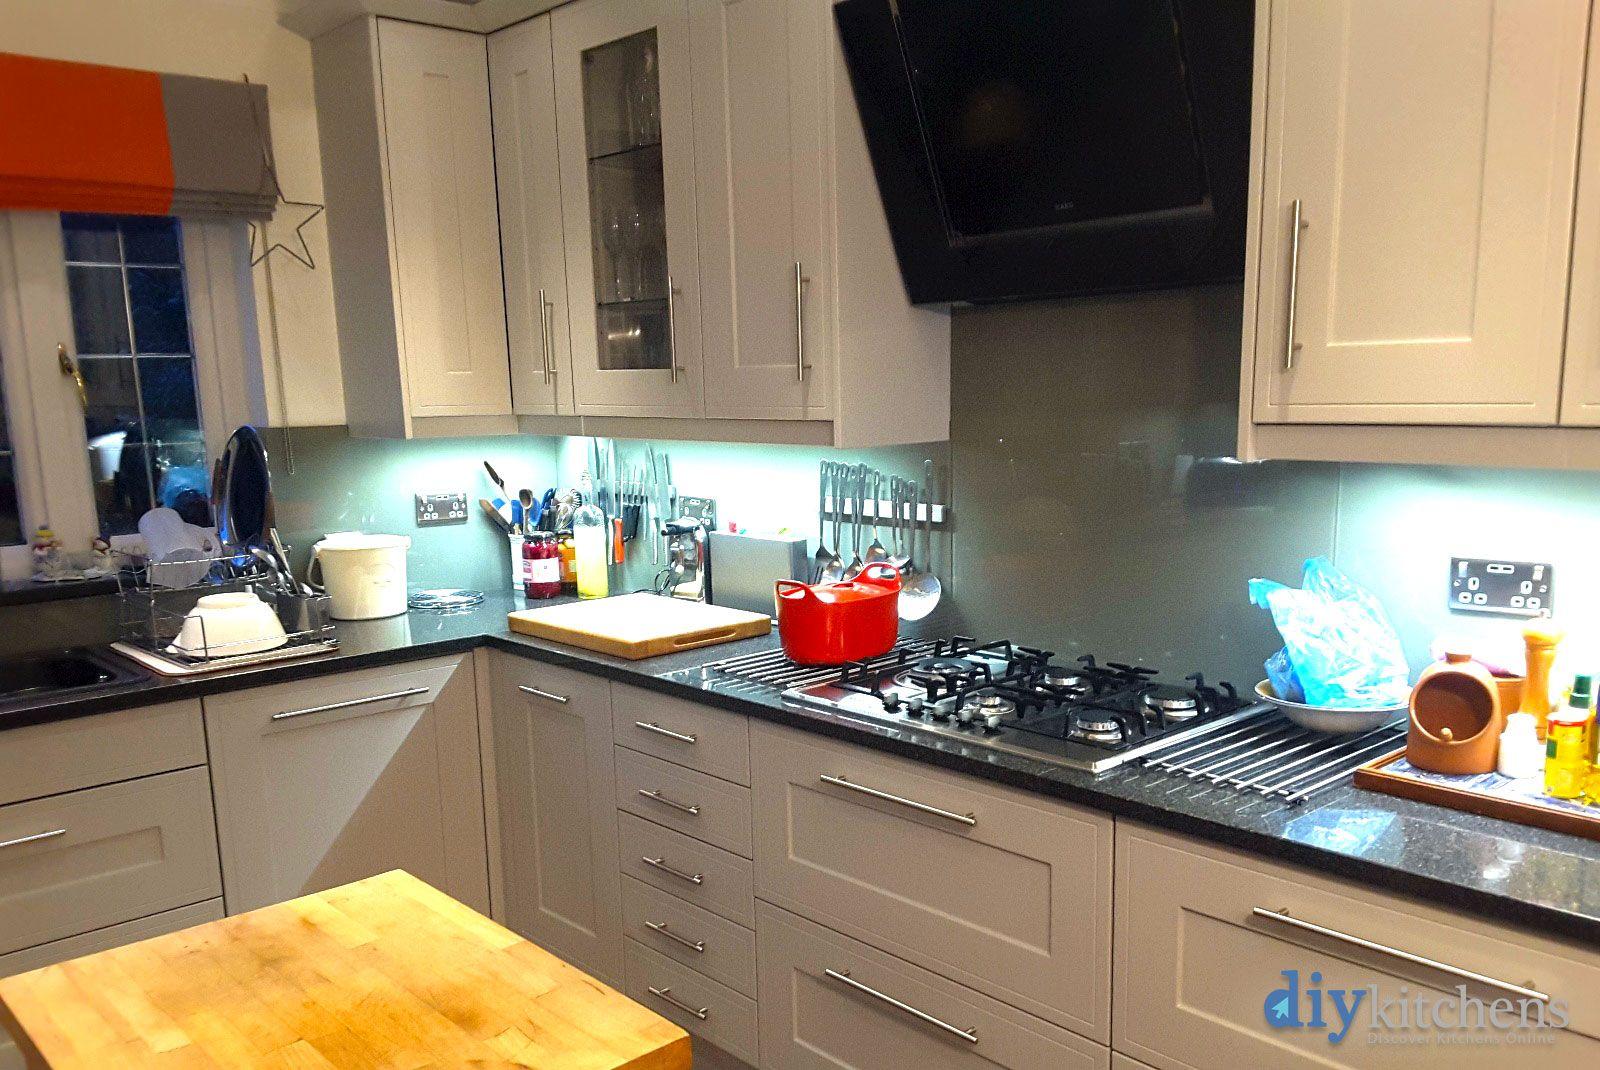 Innova Küche - An Innova Helmsley Bespoke Painted Inframe Kitchen